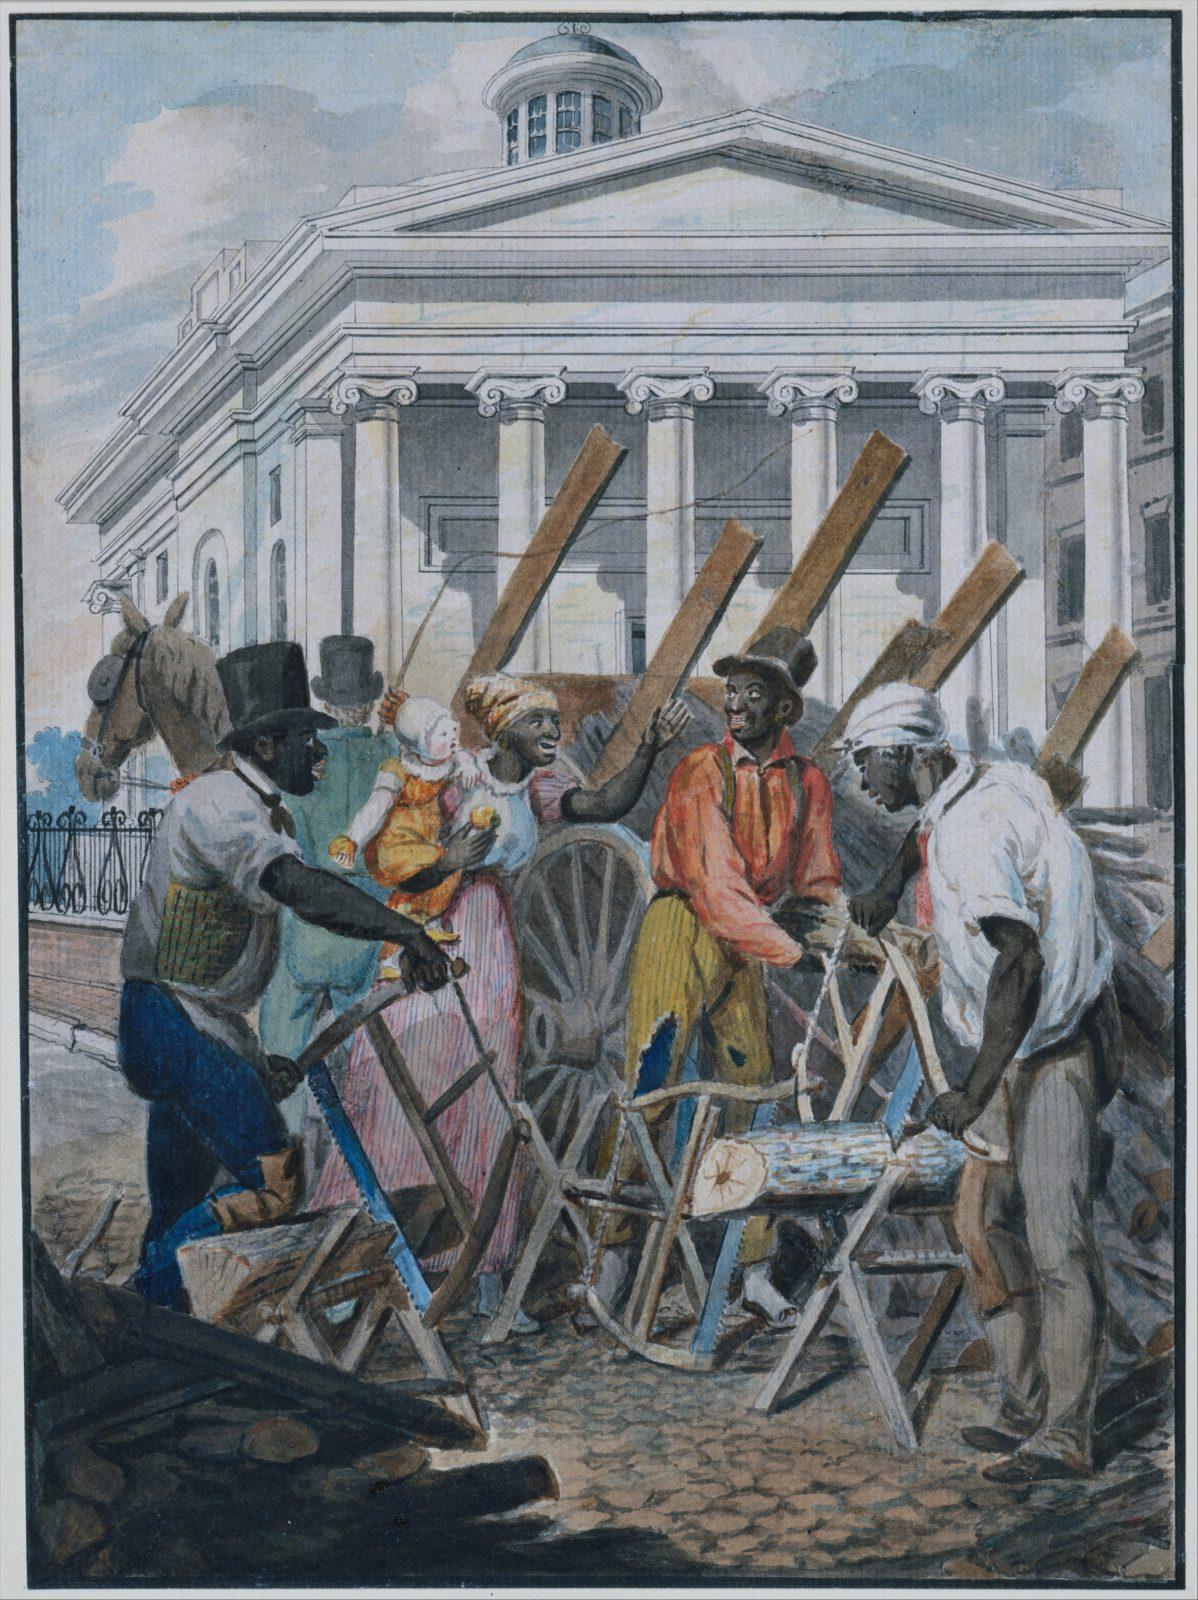 Black Sawyers Working in front of the Bank of Pennsylvania, Philadelphia